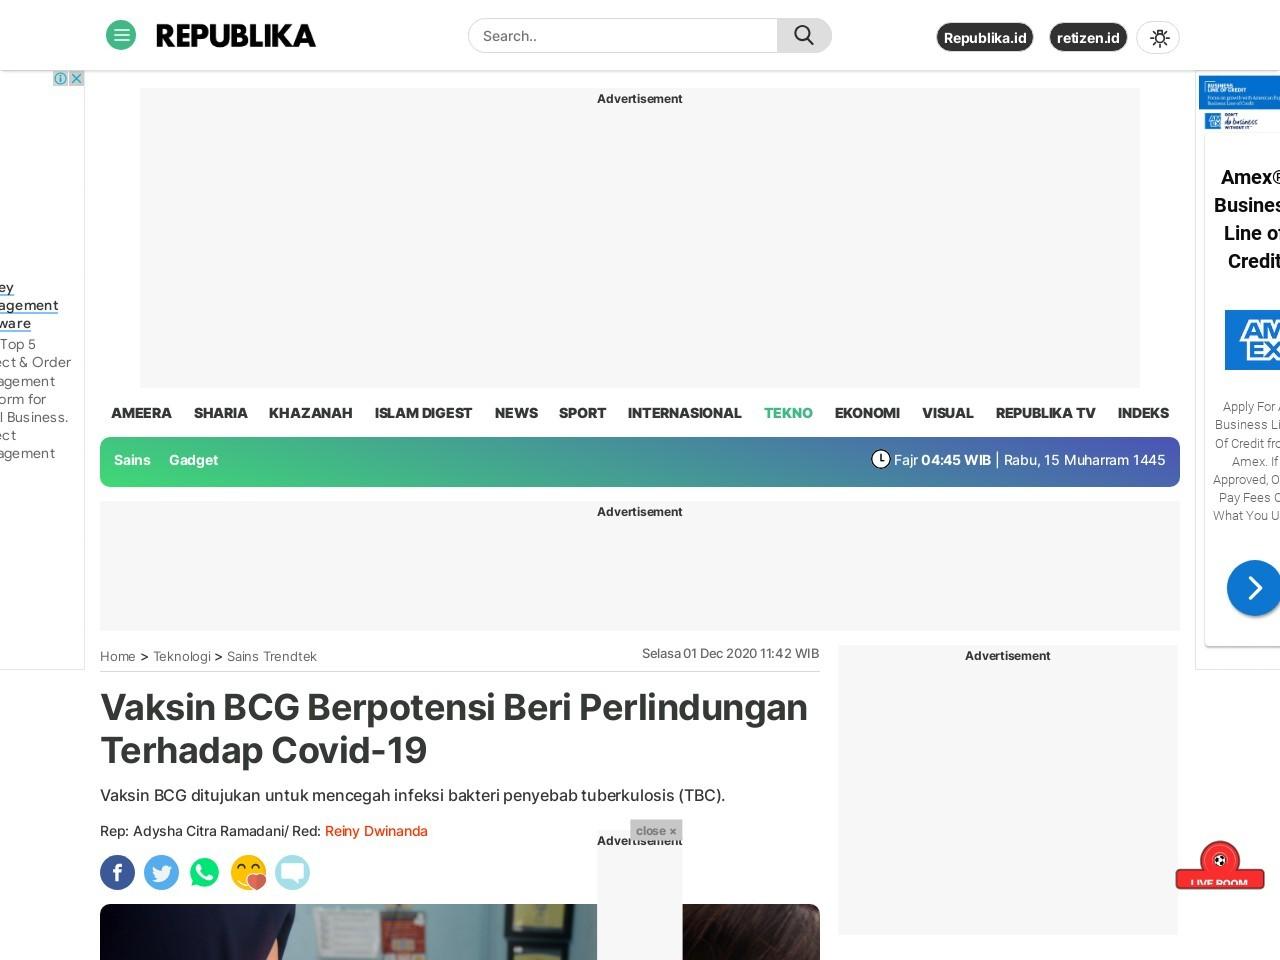 Vaksin BCG Berpotensi Beri Perlindungan Terhadap Covid-19  Republika Online